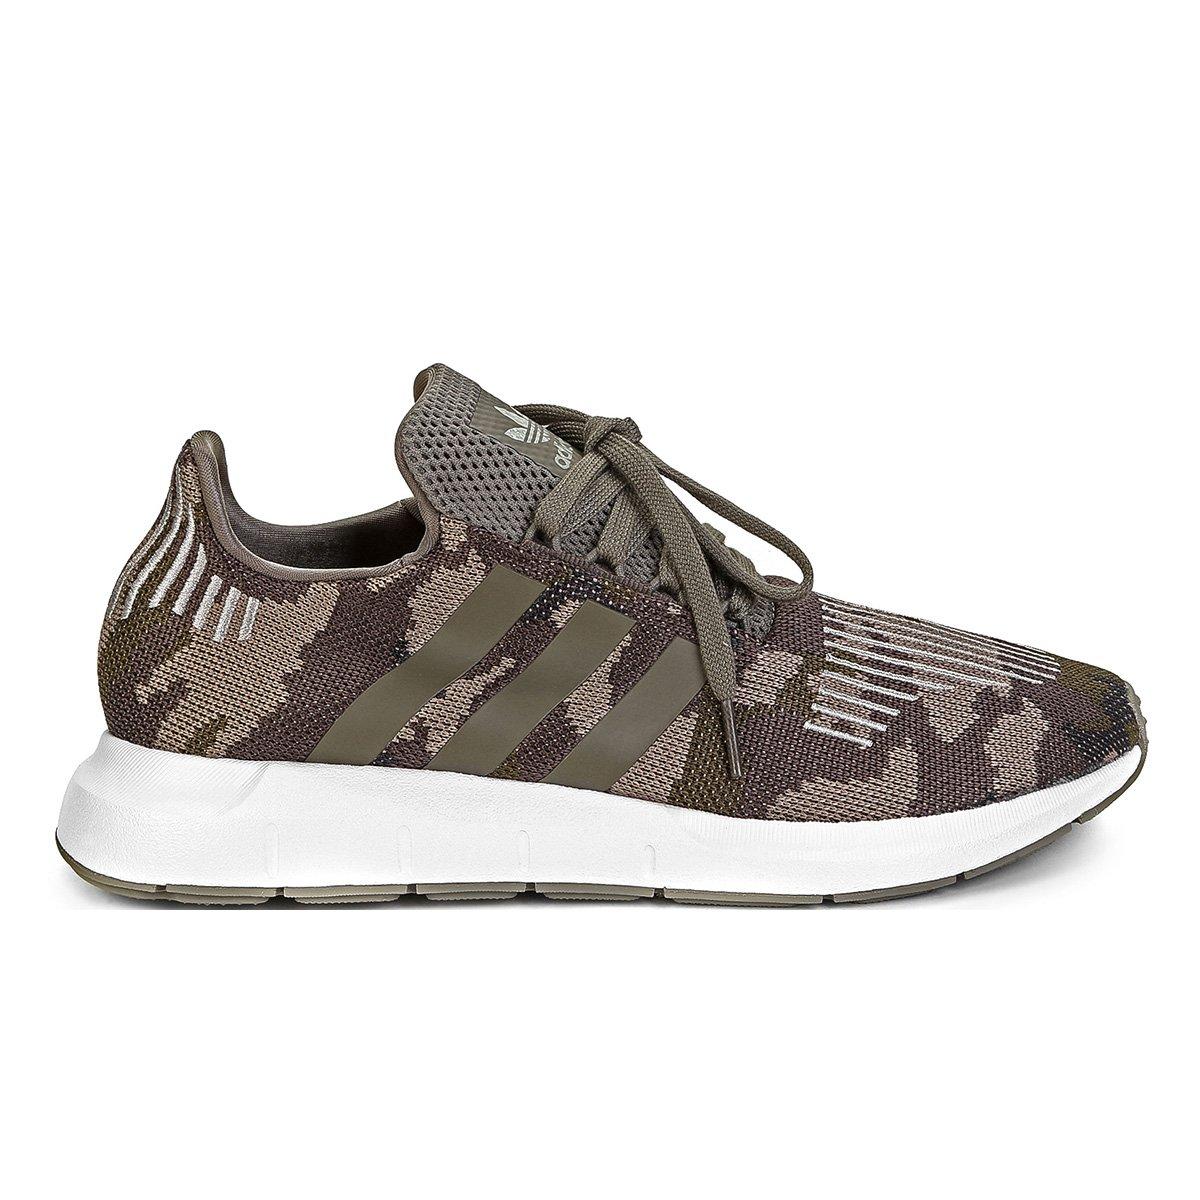 0bad7ff0d Tênis Adidas Swift Run | Netshoes